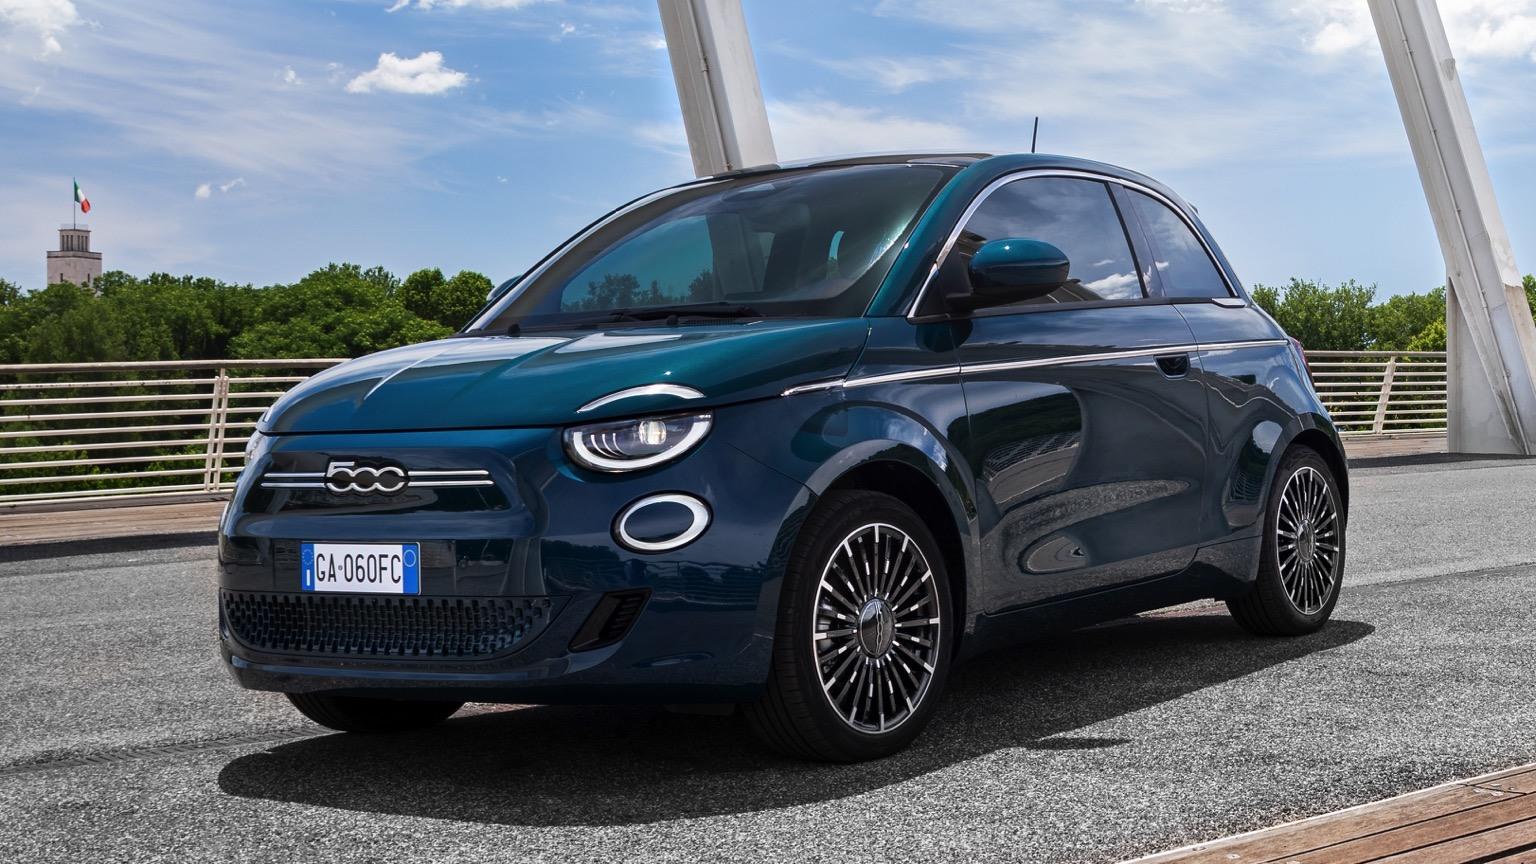 Fiat 500e Hatchback 24 kWh